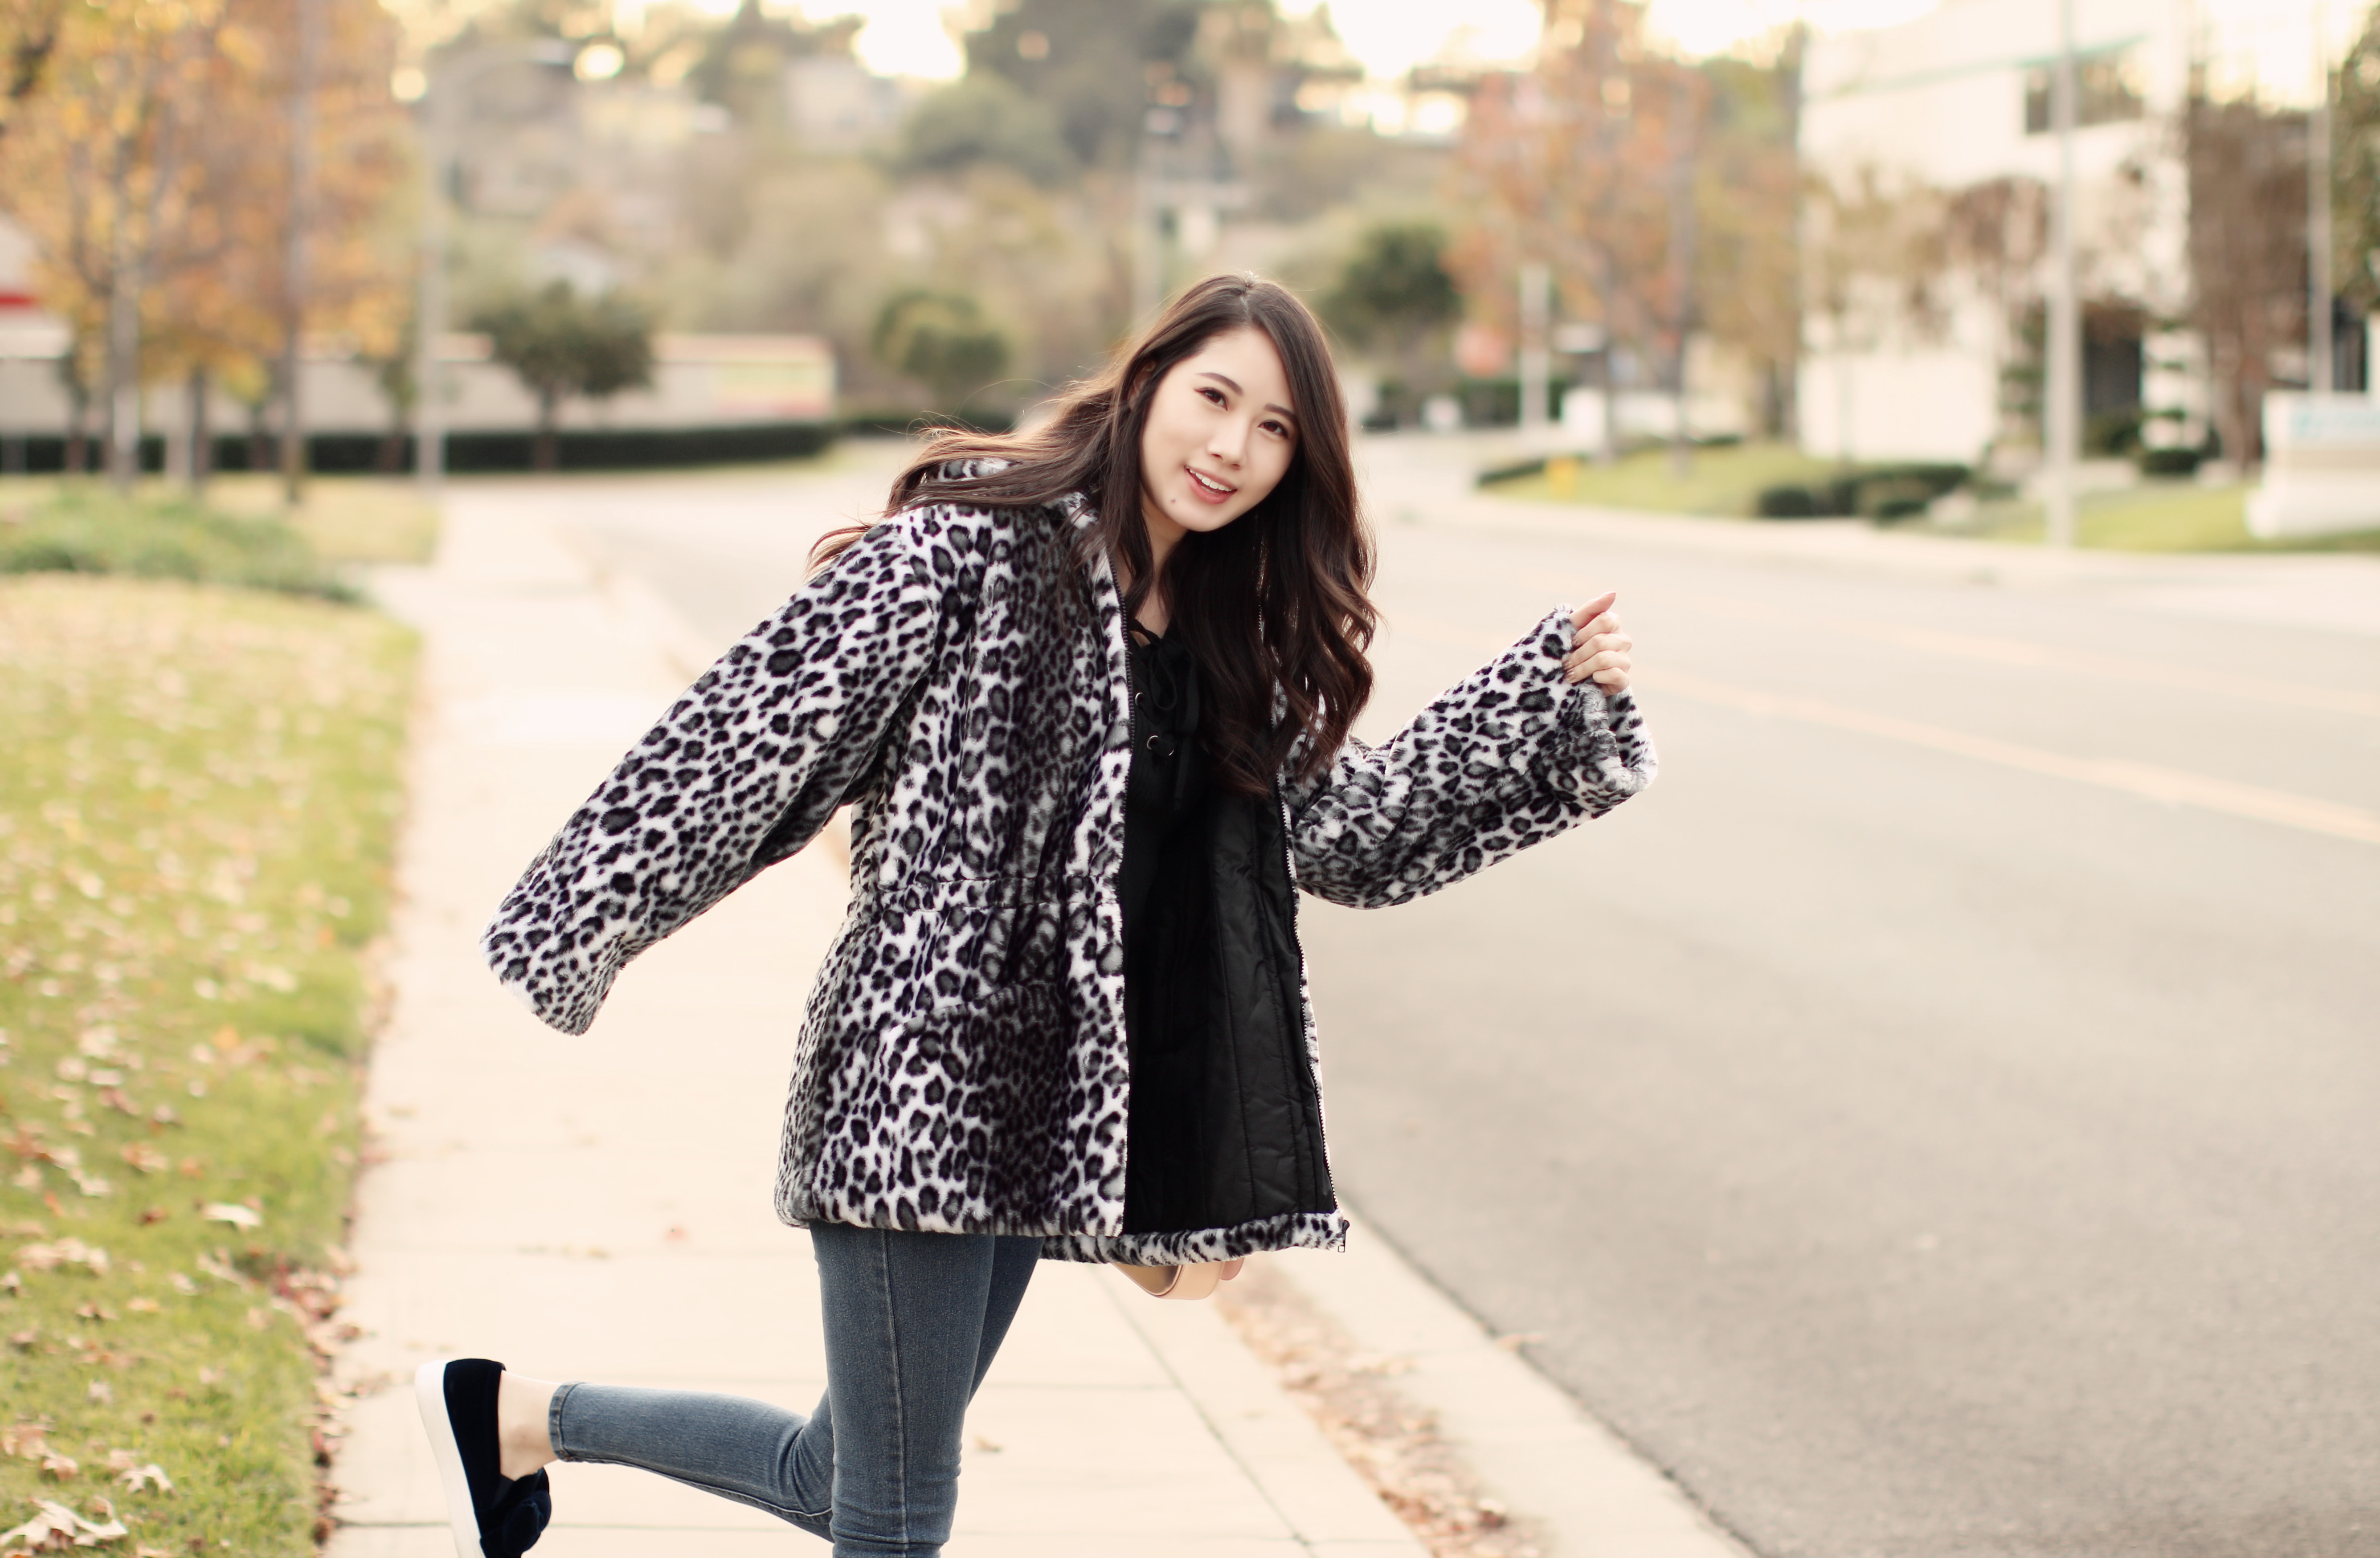 4055-ootd-fashion-style-outfitoftheday-wiwt-streetstyle-furcoat-fauxfur-forever21-f21xme-hollister-hcostylescene-elizabeeetht-clothestoyouuu